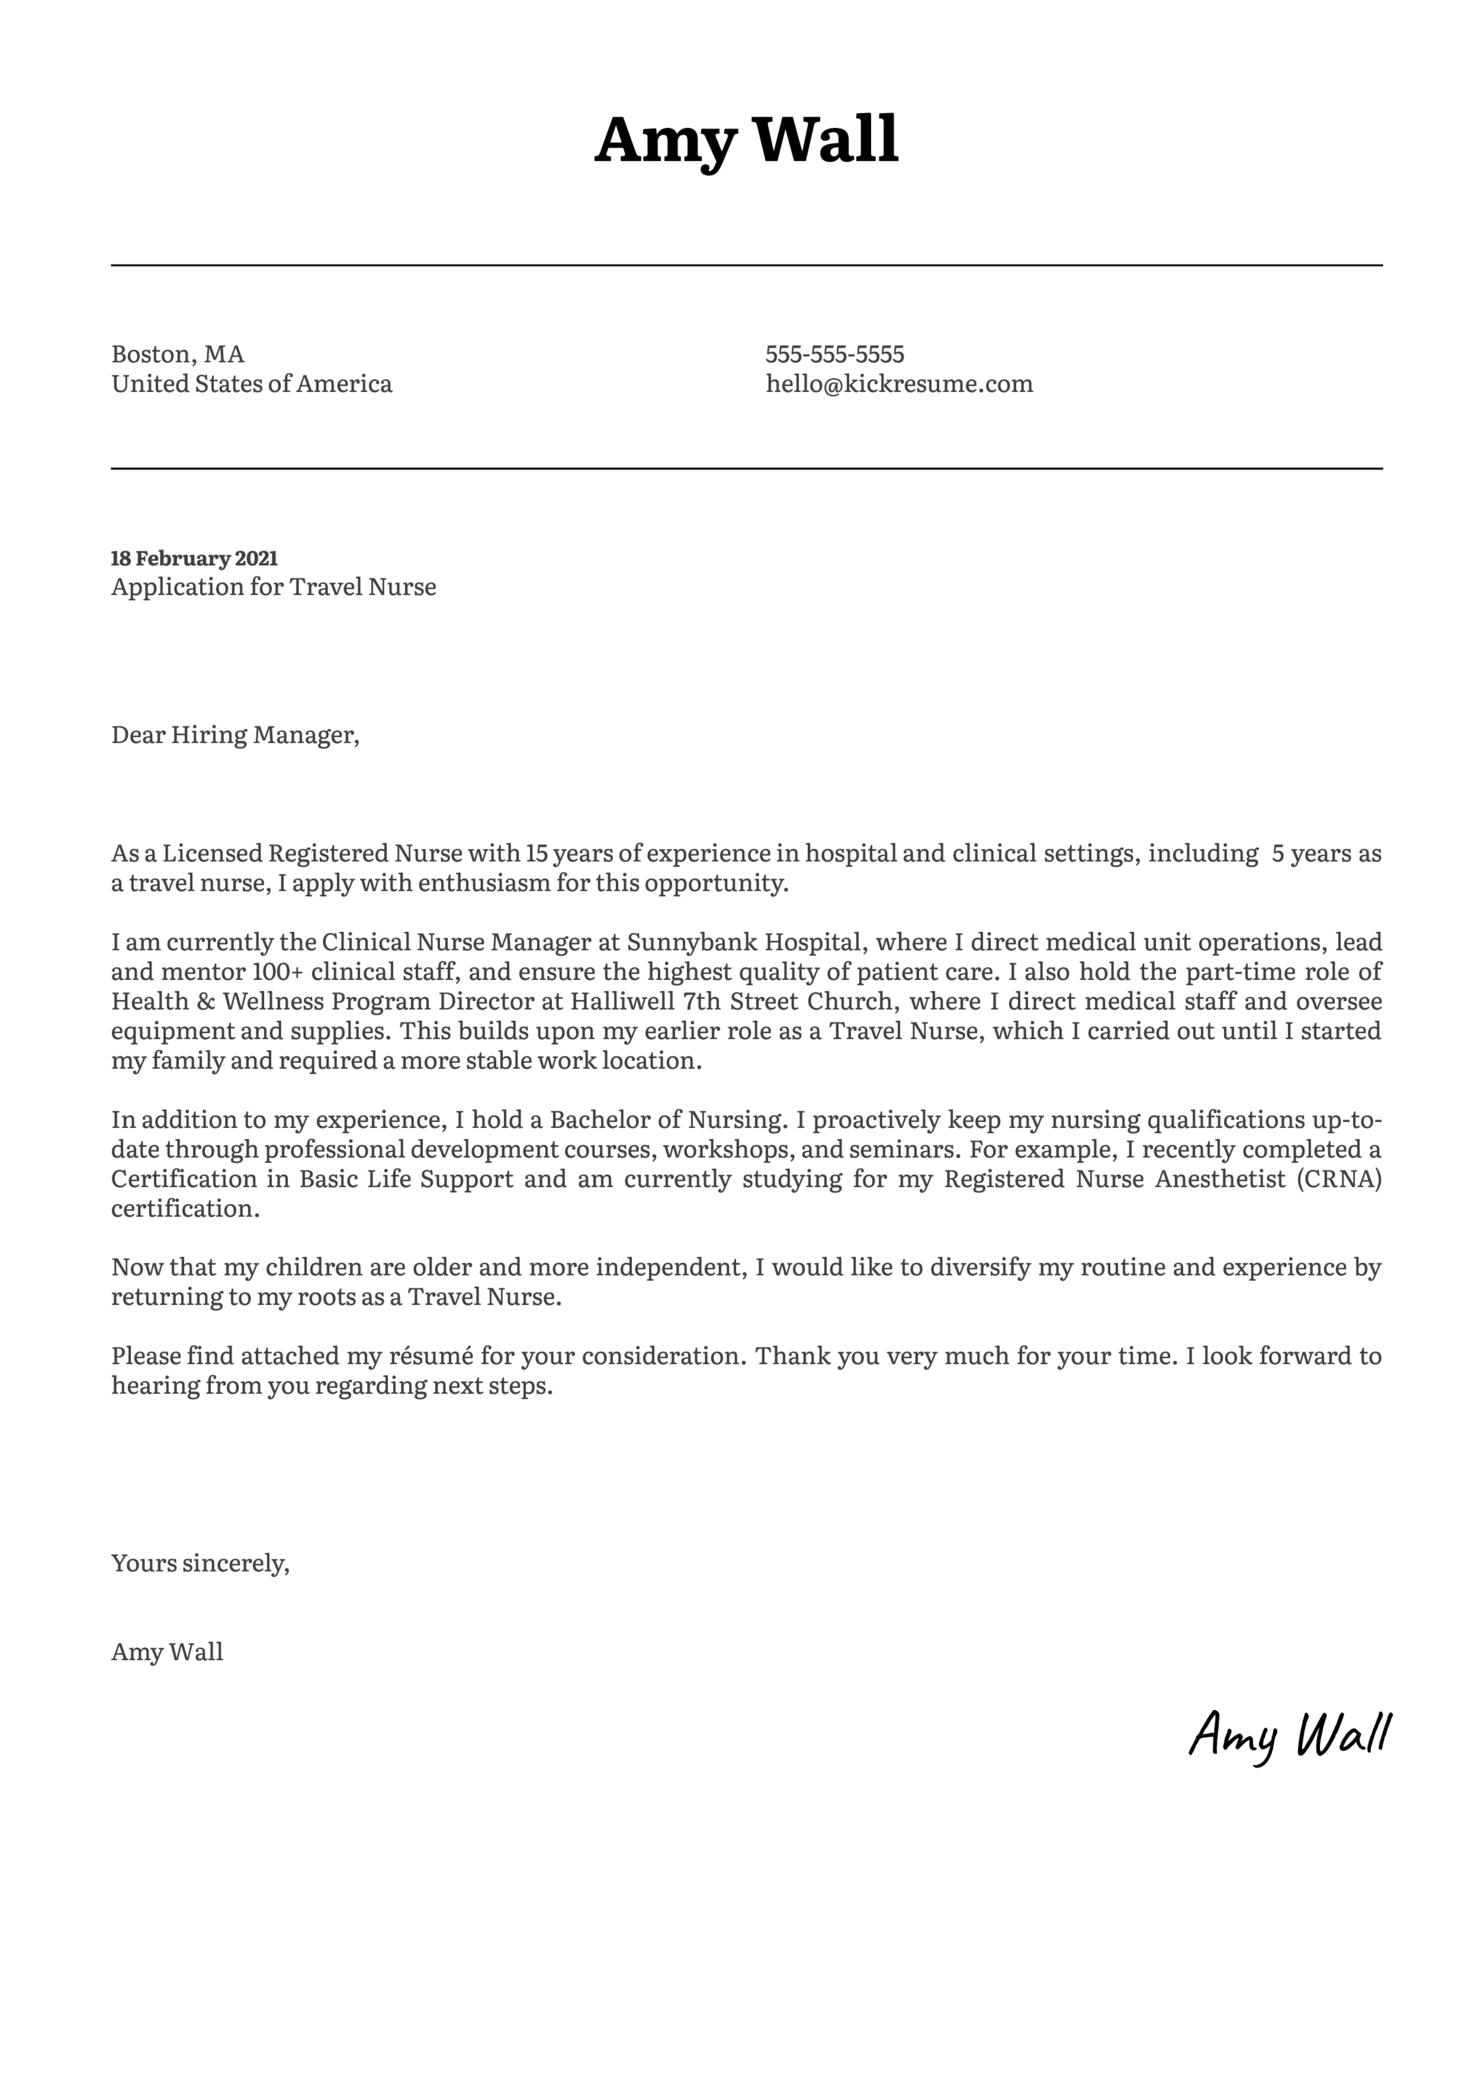 Travel Nurse Cover Letter Template